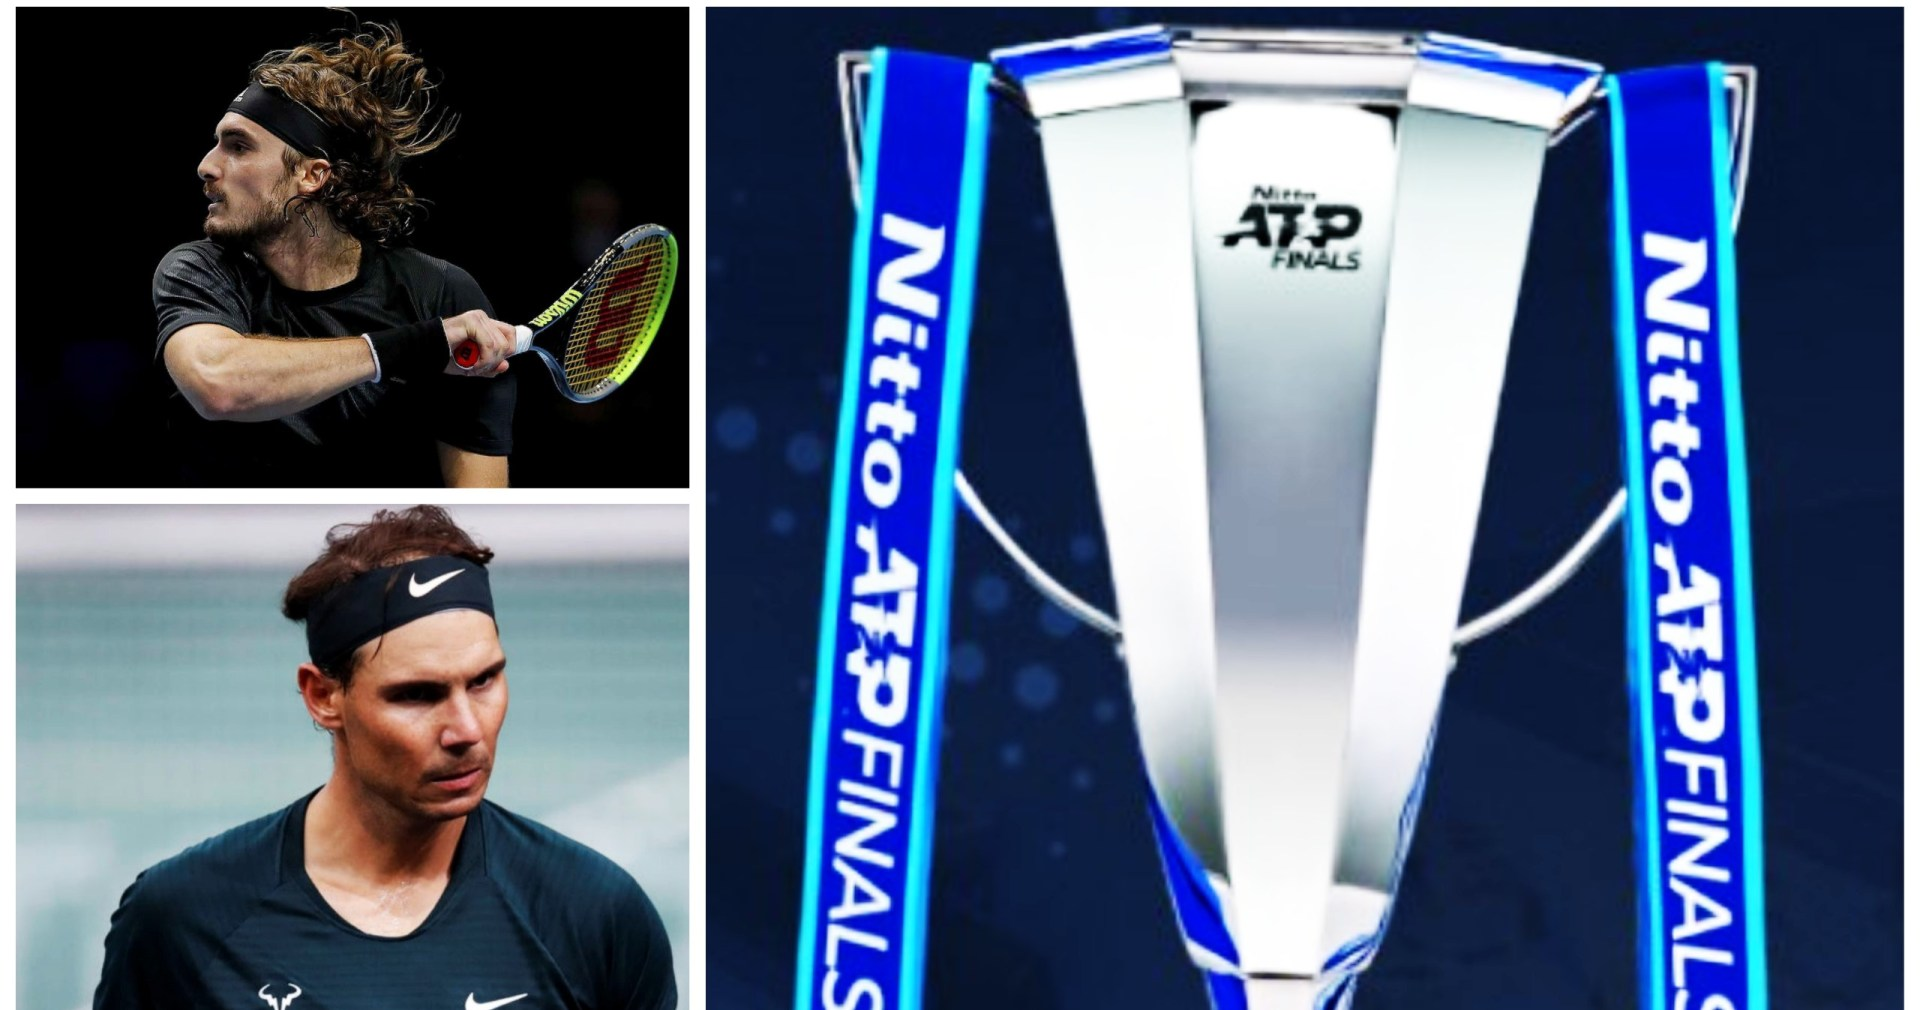 Resurgent Rafa-Nadal defeats Tsitsipas to keep his hopes alive at ATP Finals 2020 - THE SPORTS ROOM